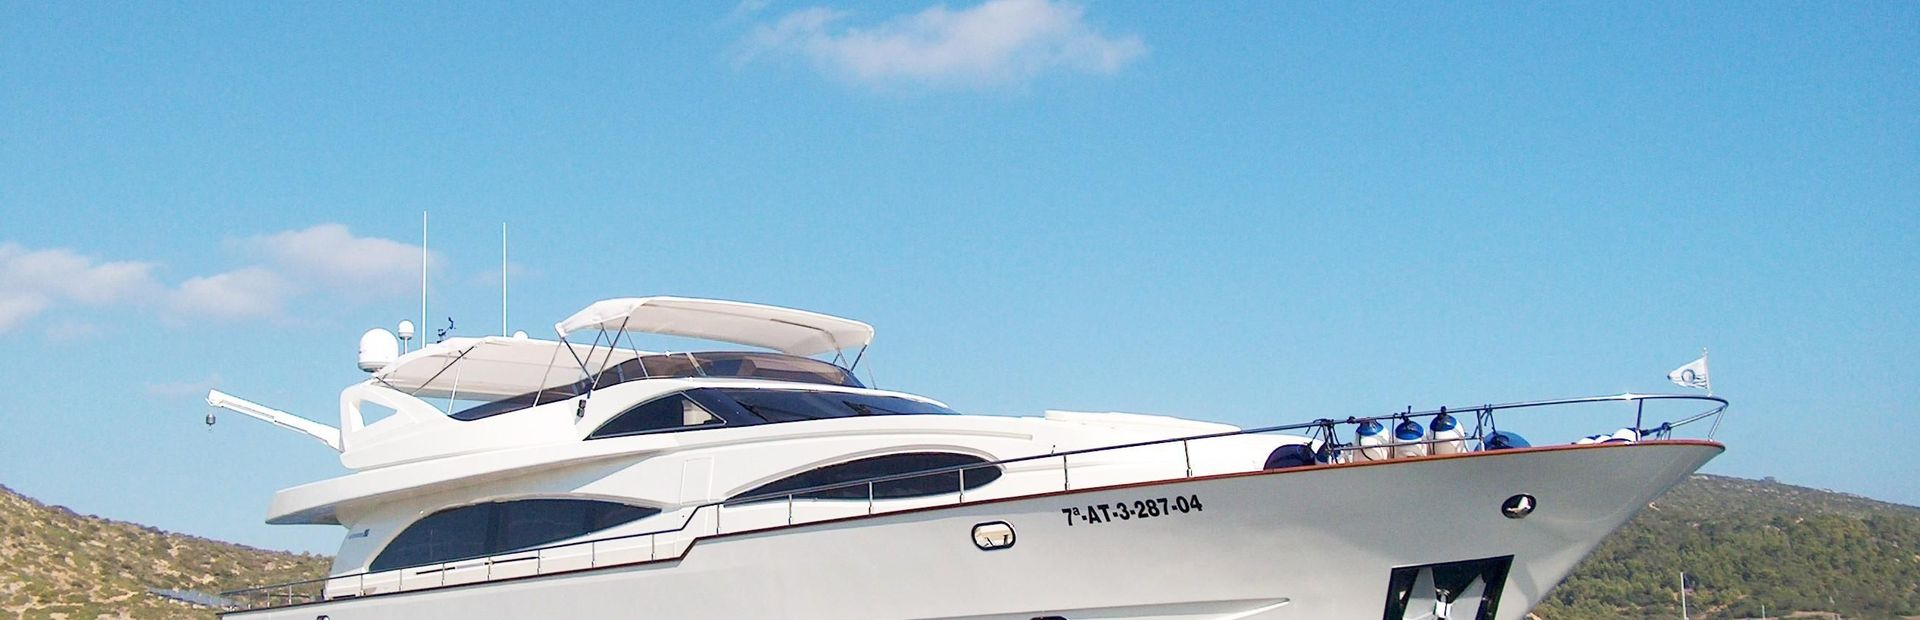 95 GLX Yacht Charter